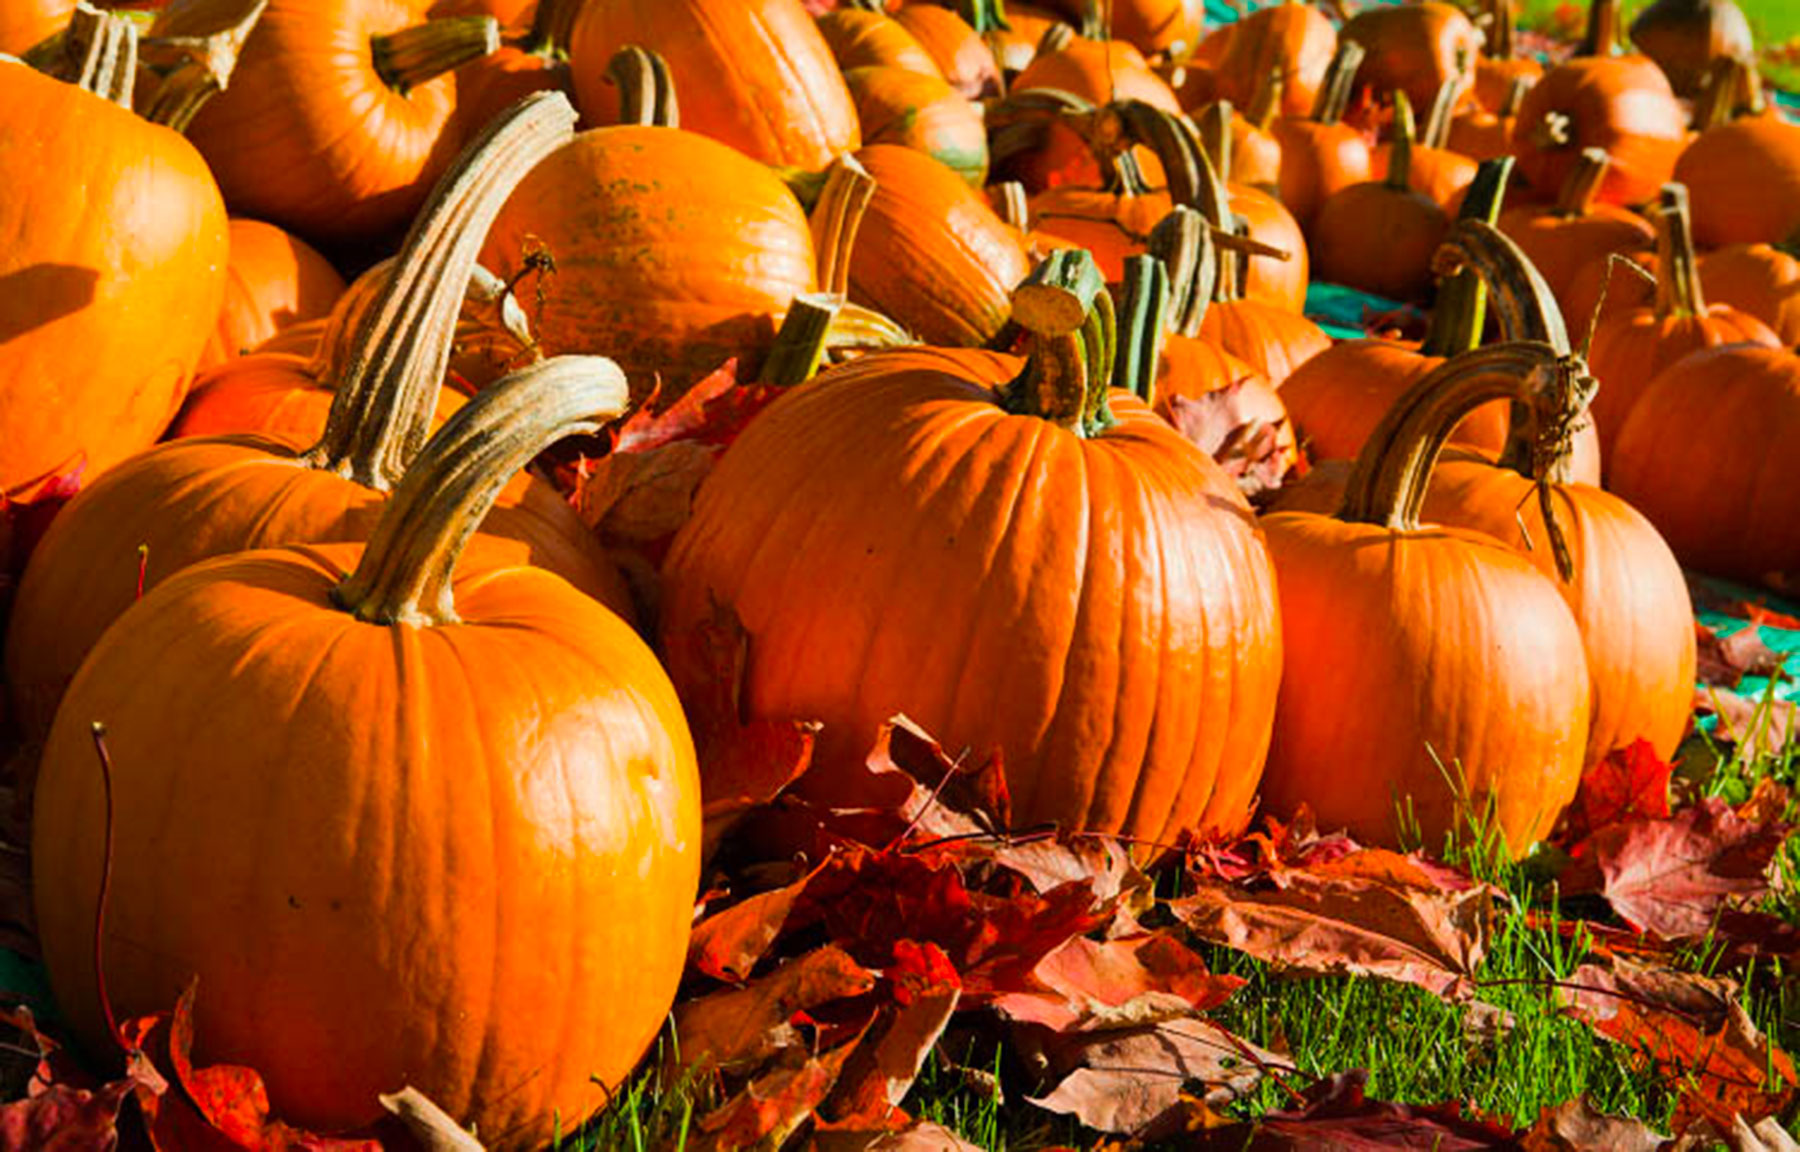 Make your own pumpkin pie with locally grown pumpkins